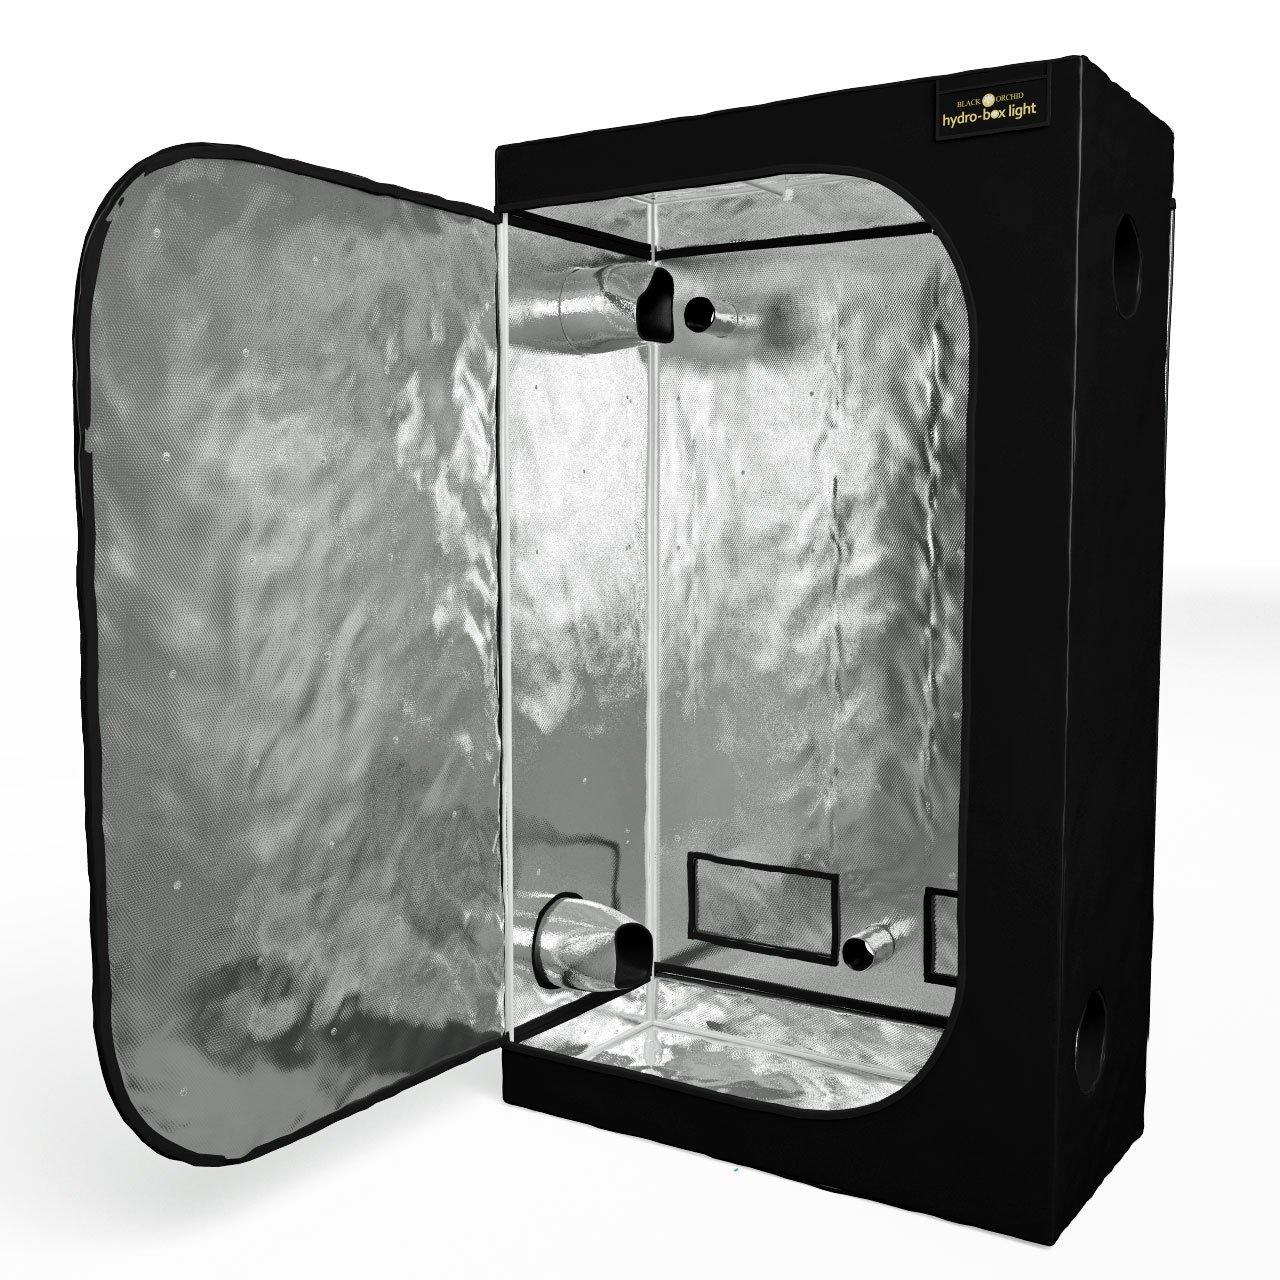 Black Orchid Hydro-box, 40x40x100cm Hydroponic Grow Tent